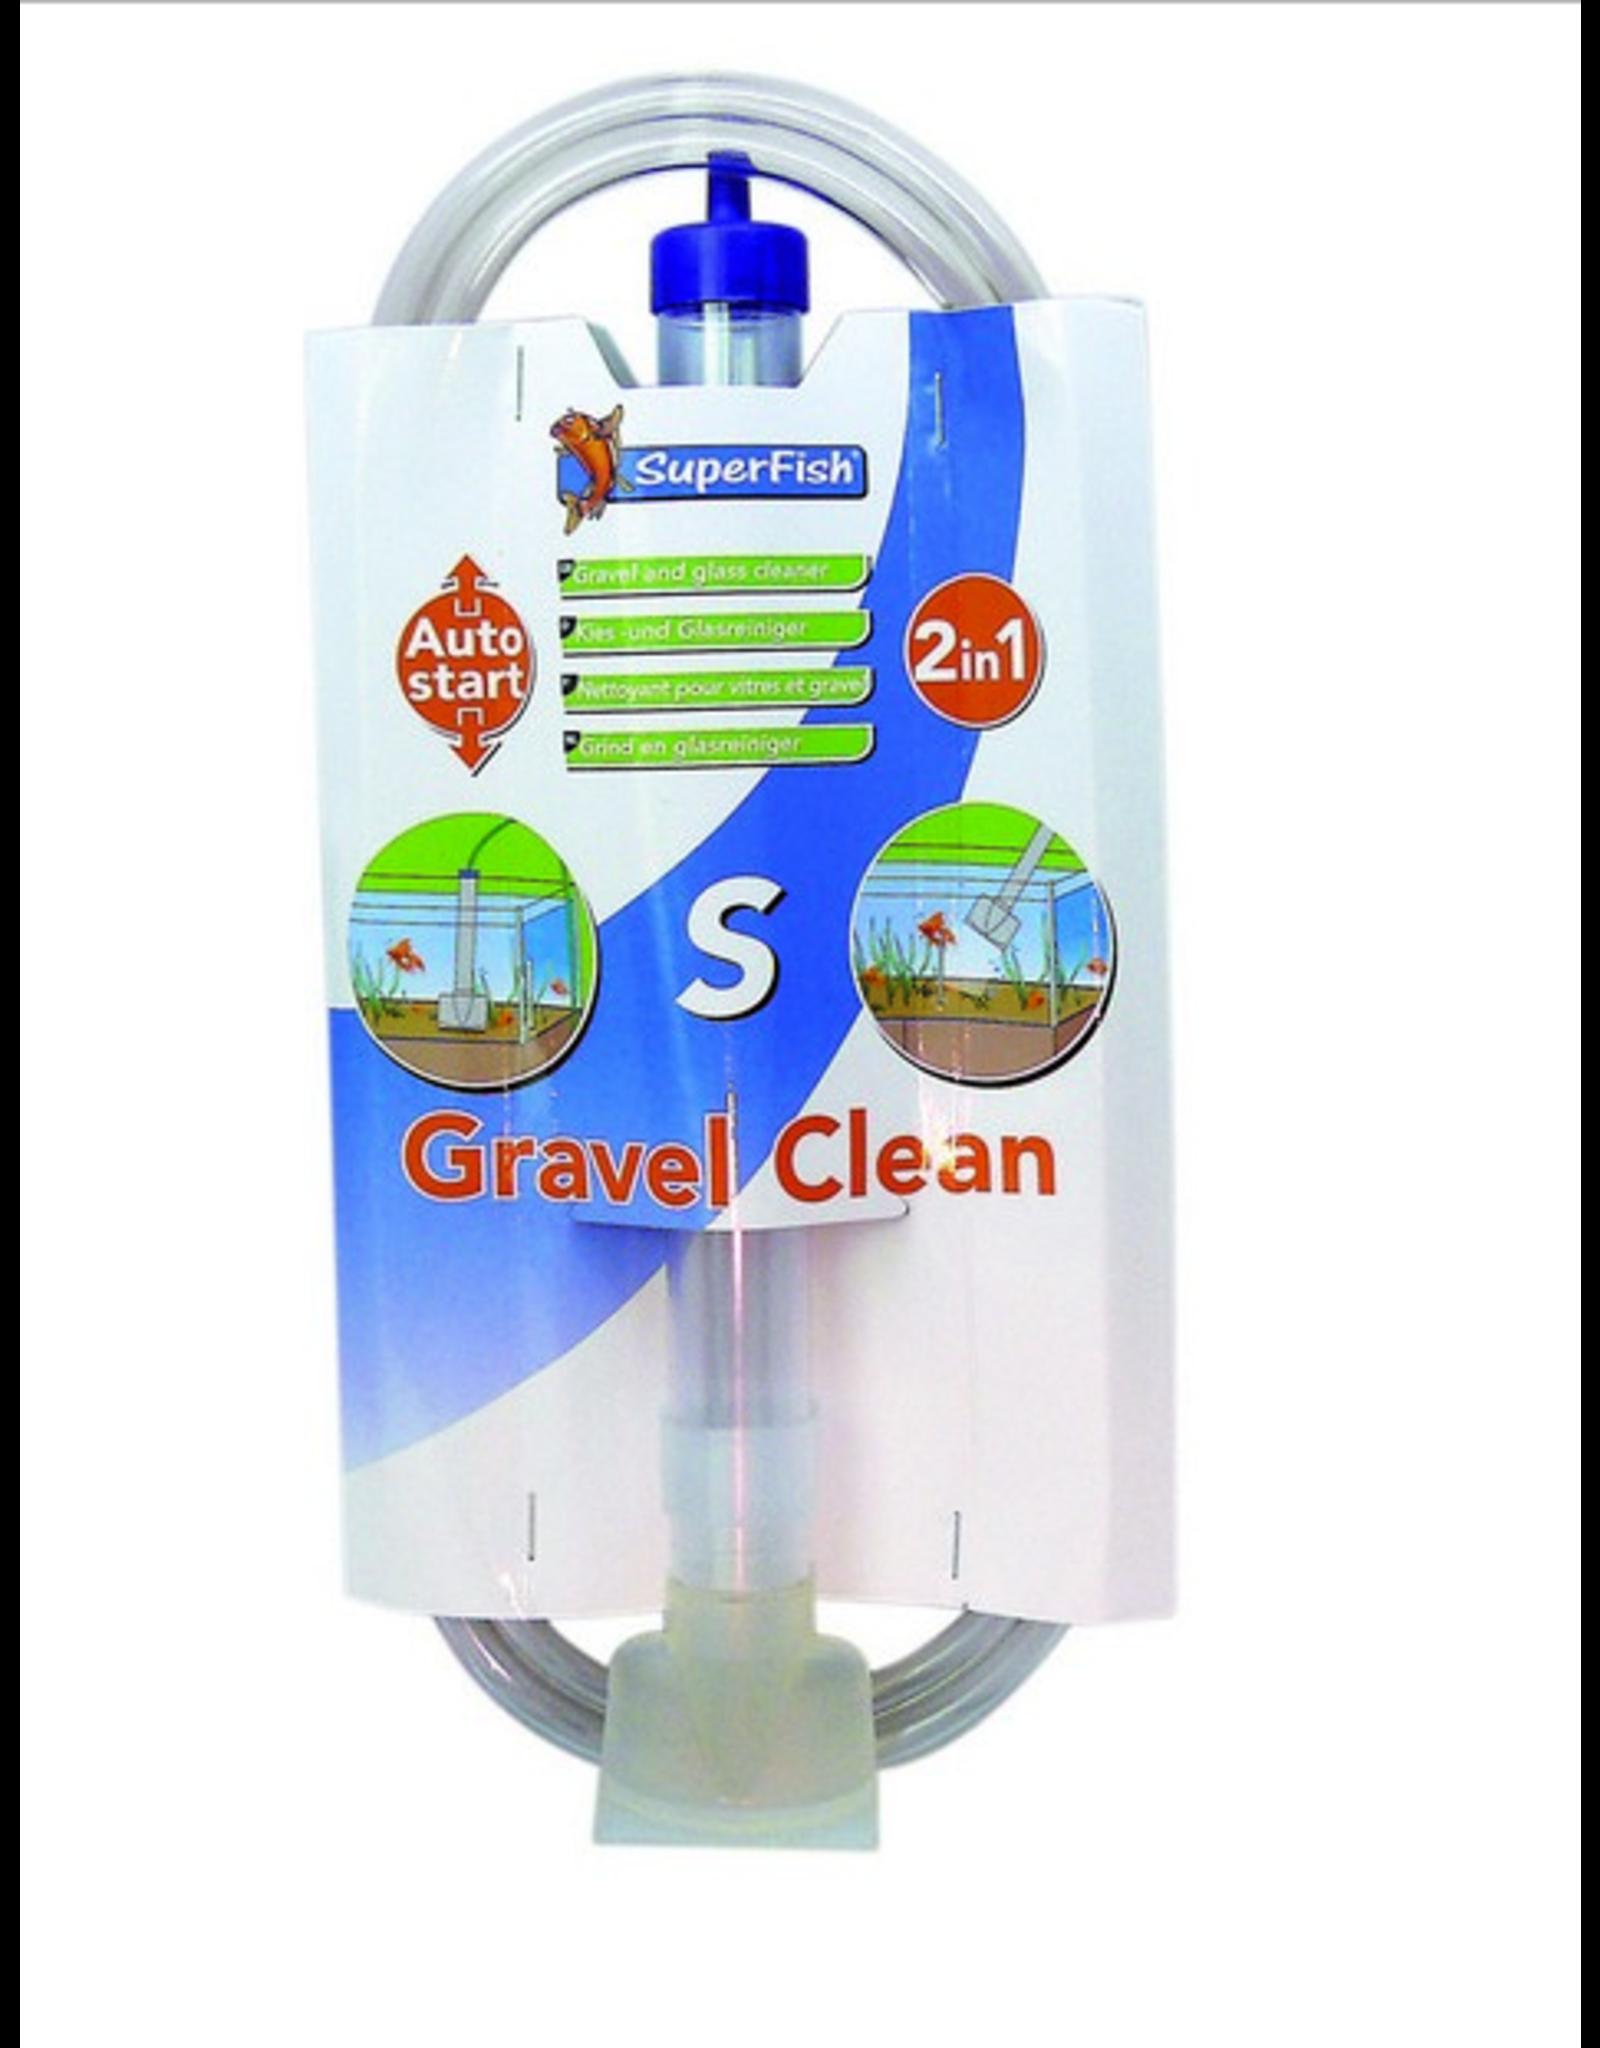 SuperFish SuperFish Gravel Cleaner